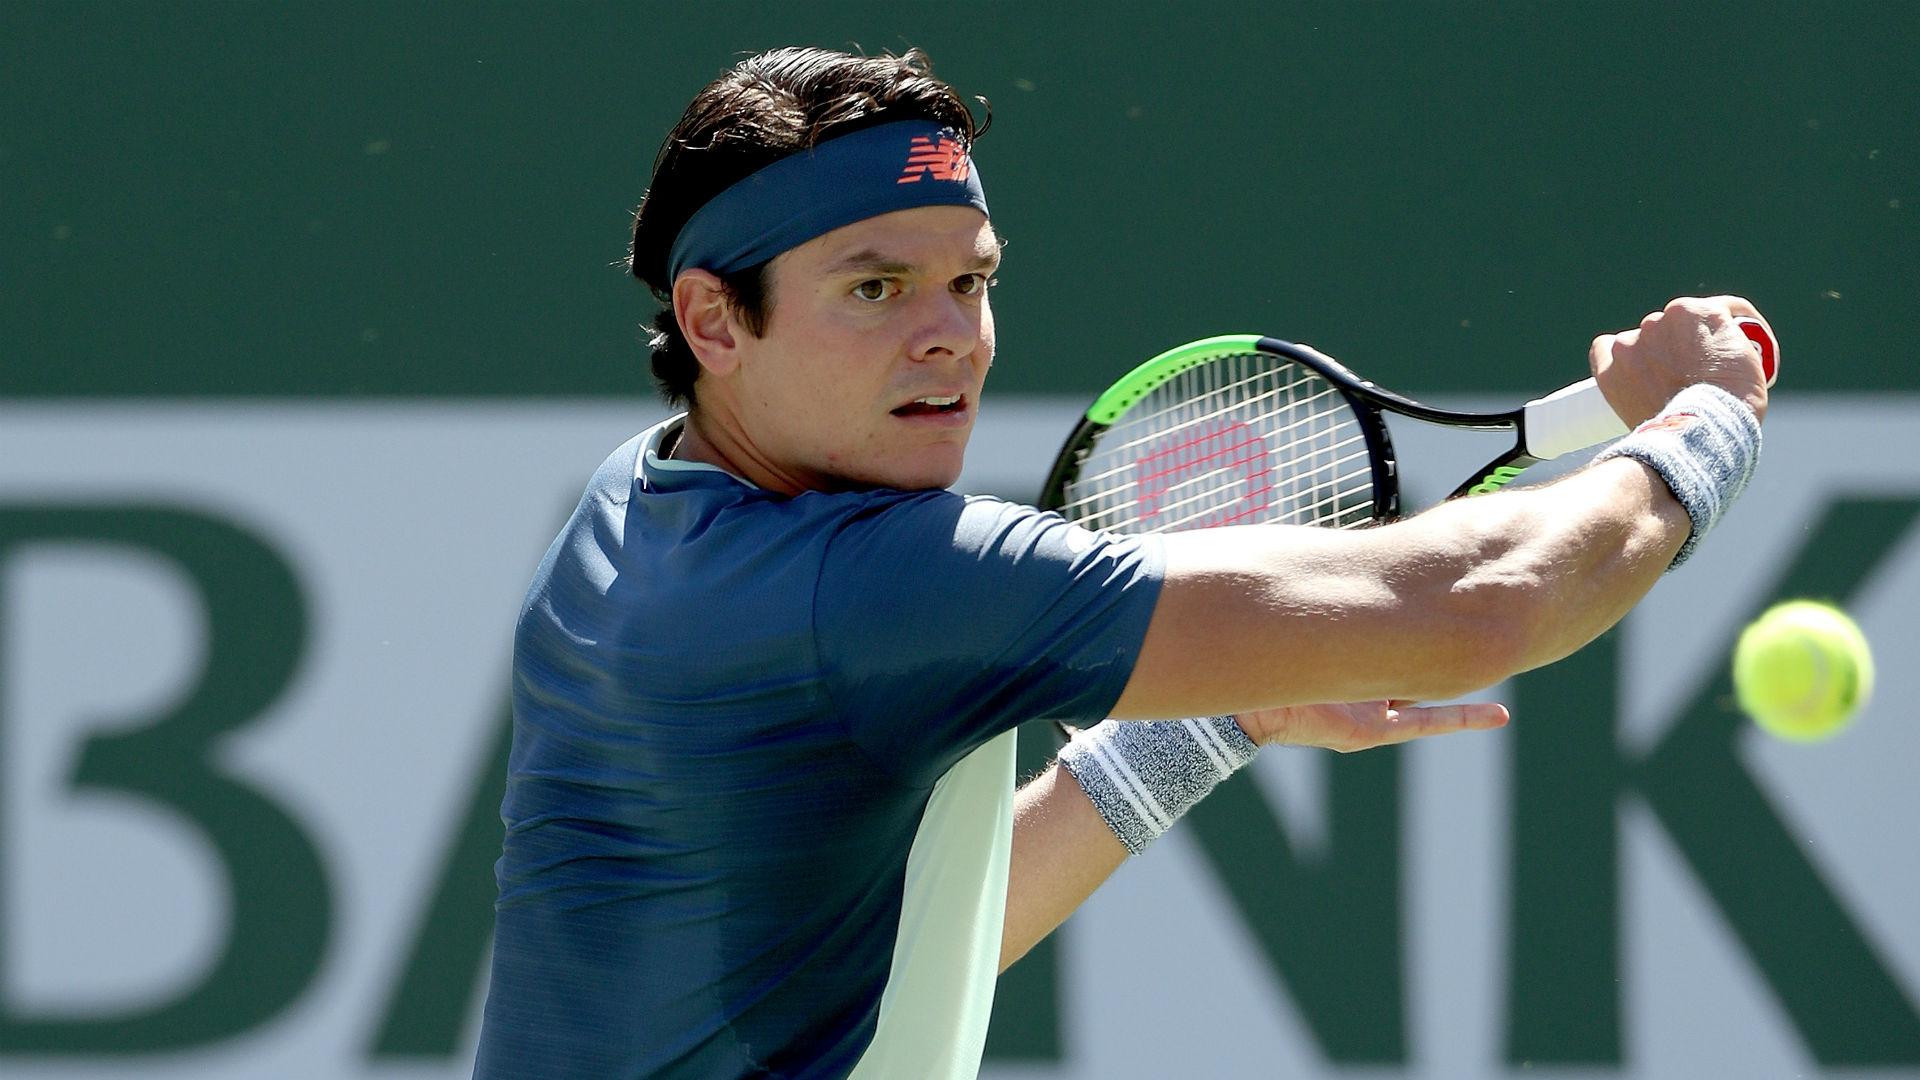 Raonic edges out Tsonga at Stuttgart Open, Coric fights back in 's-Hertogenbosch